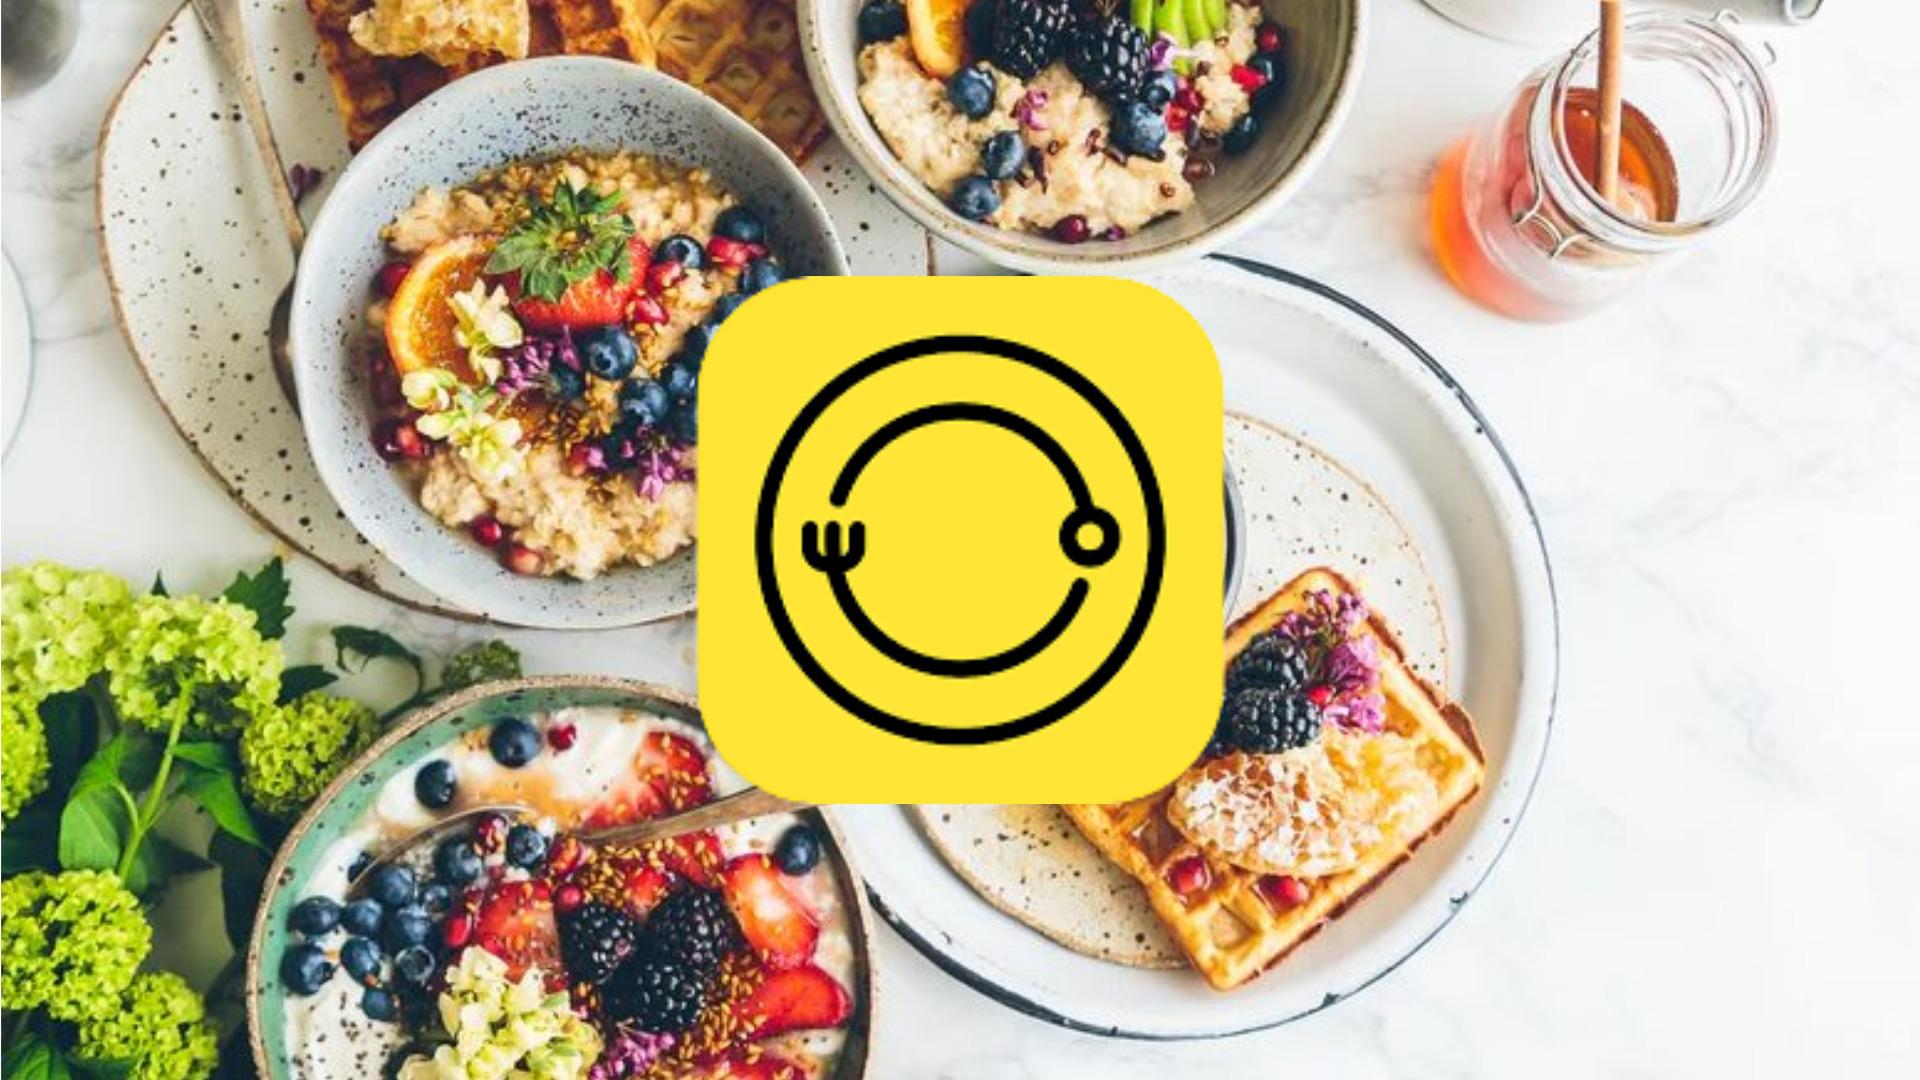 App chụp hình đồ ăn đẹp - Foodie